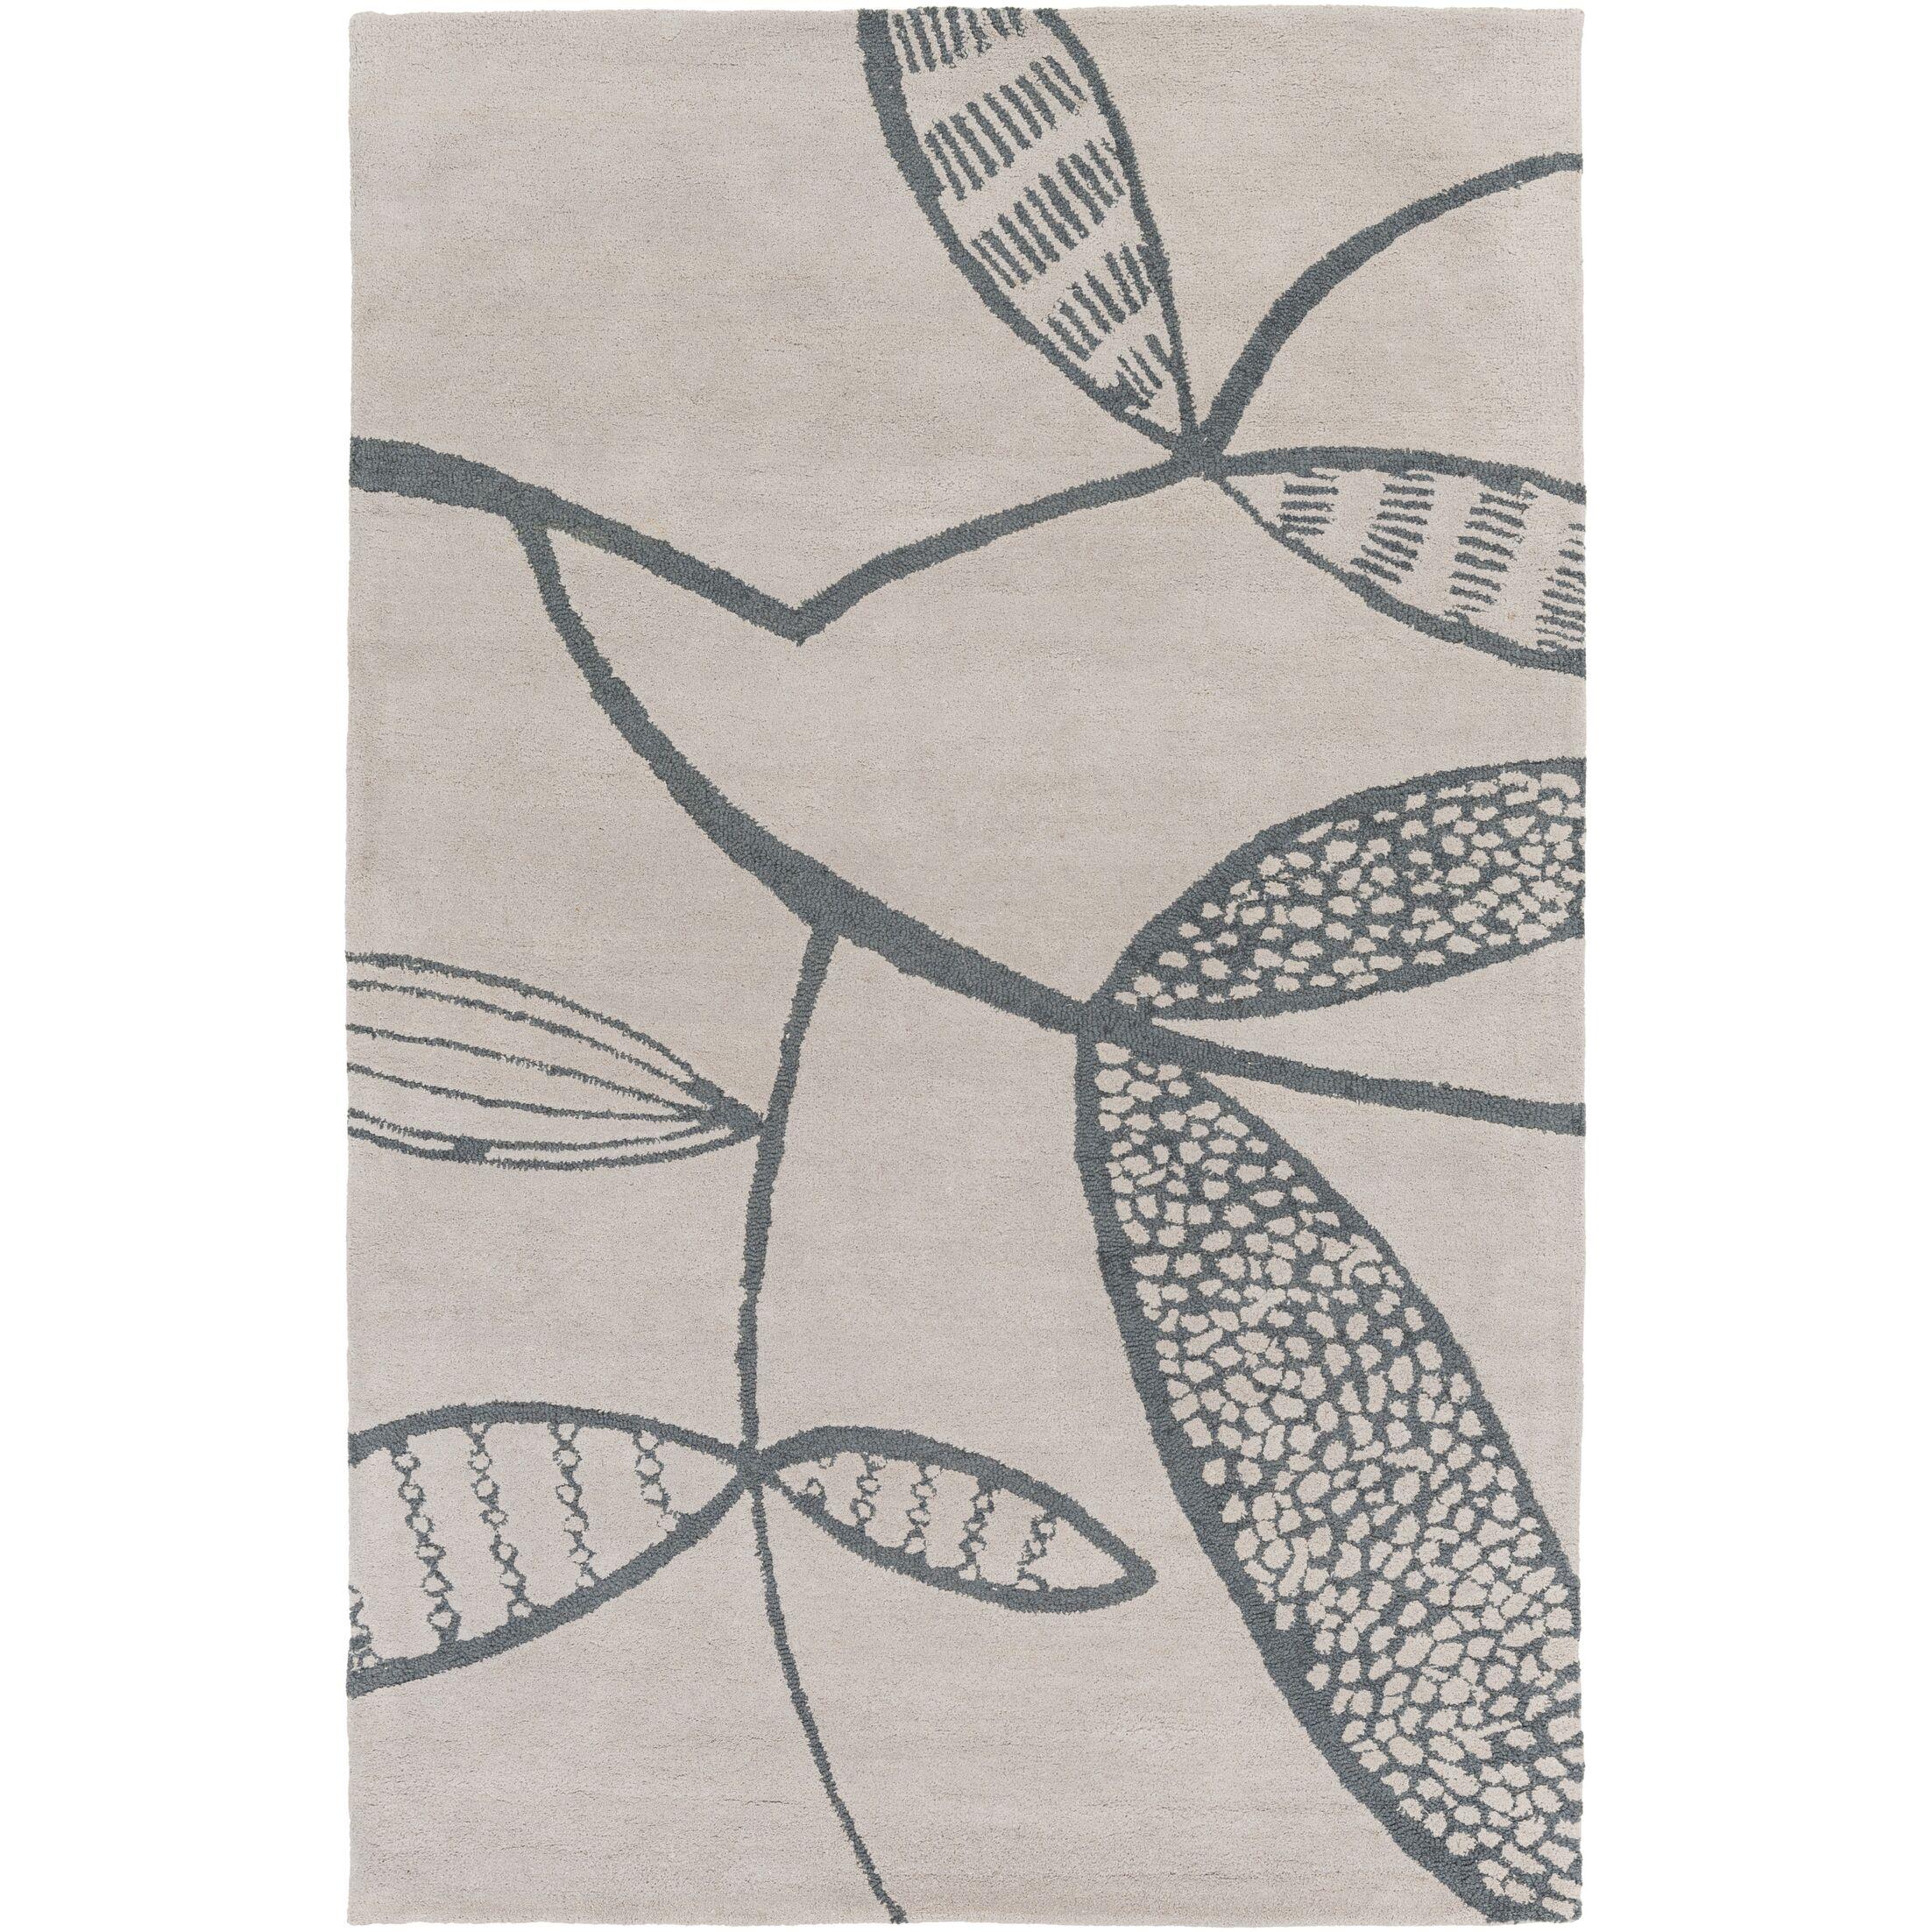 Decorativa Hand-Tufted Gray/Black Area Rug Rug Size: Rectangle 3'3